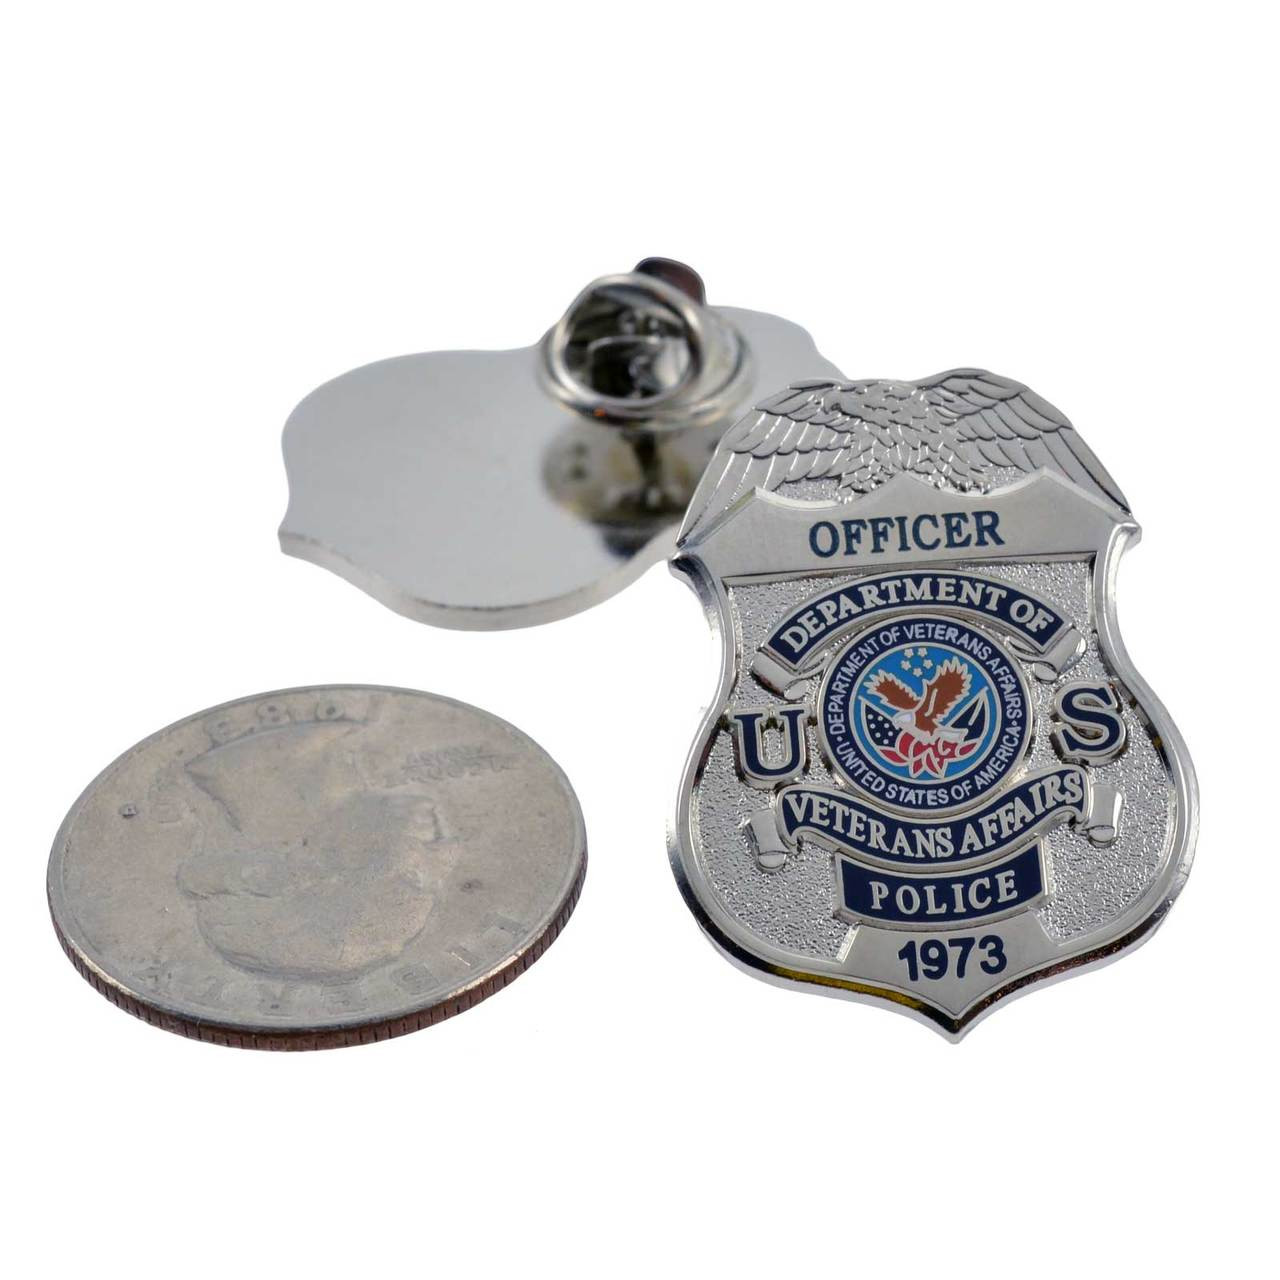 VETERANS AFFAIRS POLICE LAPEL PIN